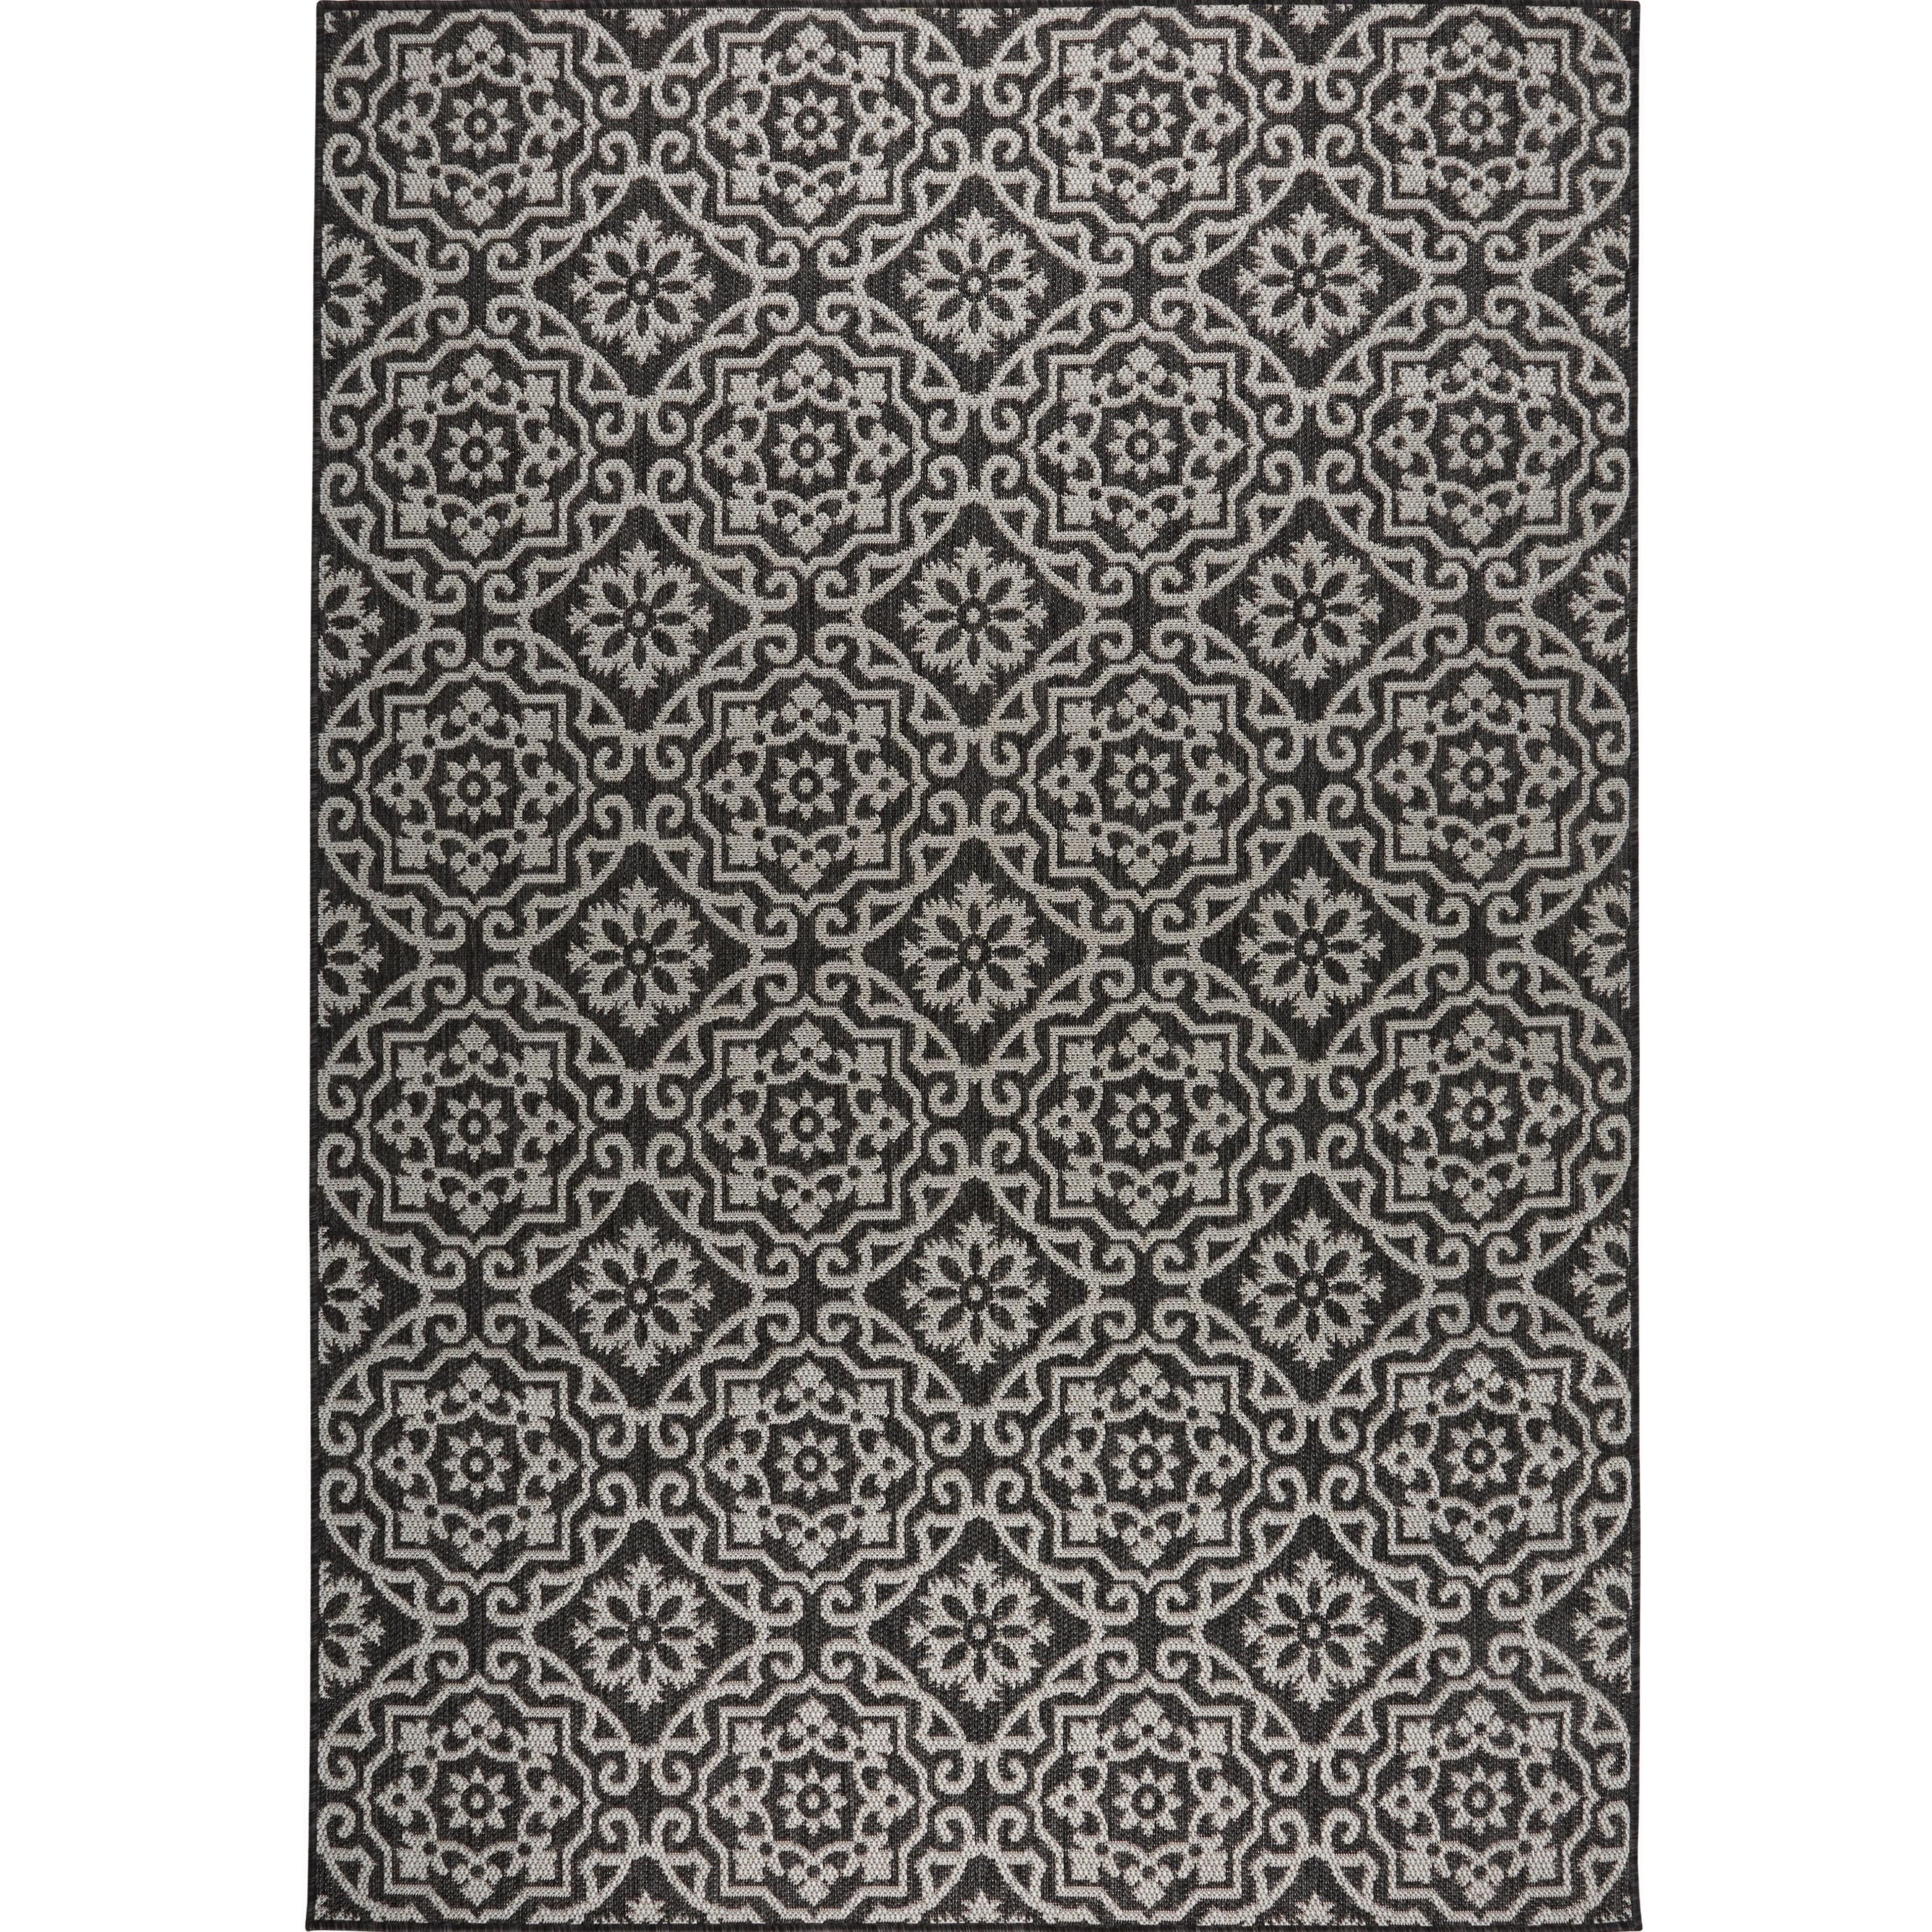 Shop Patio Country Black Gray Tiled IndoorOutdoor Rug